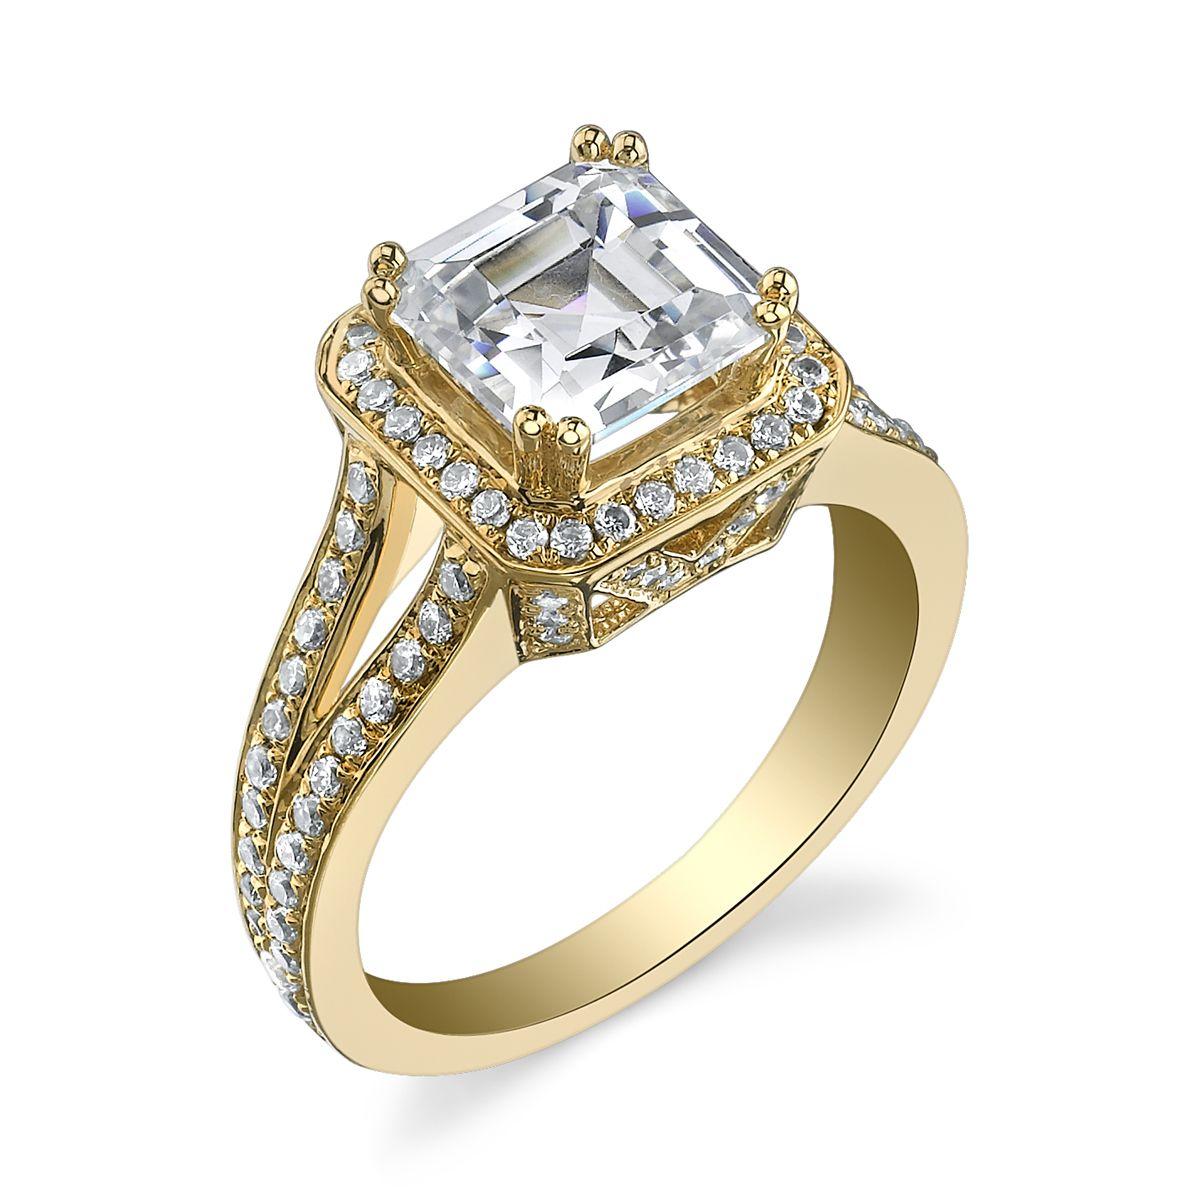 W.R. Cobb of New York   Custom jewelry design, Wedding ...